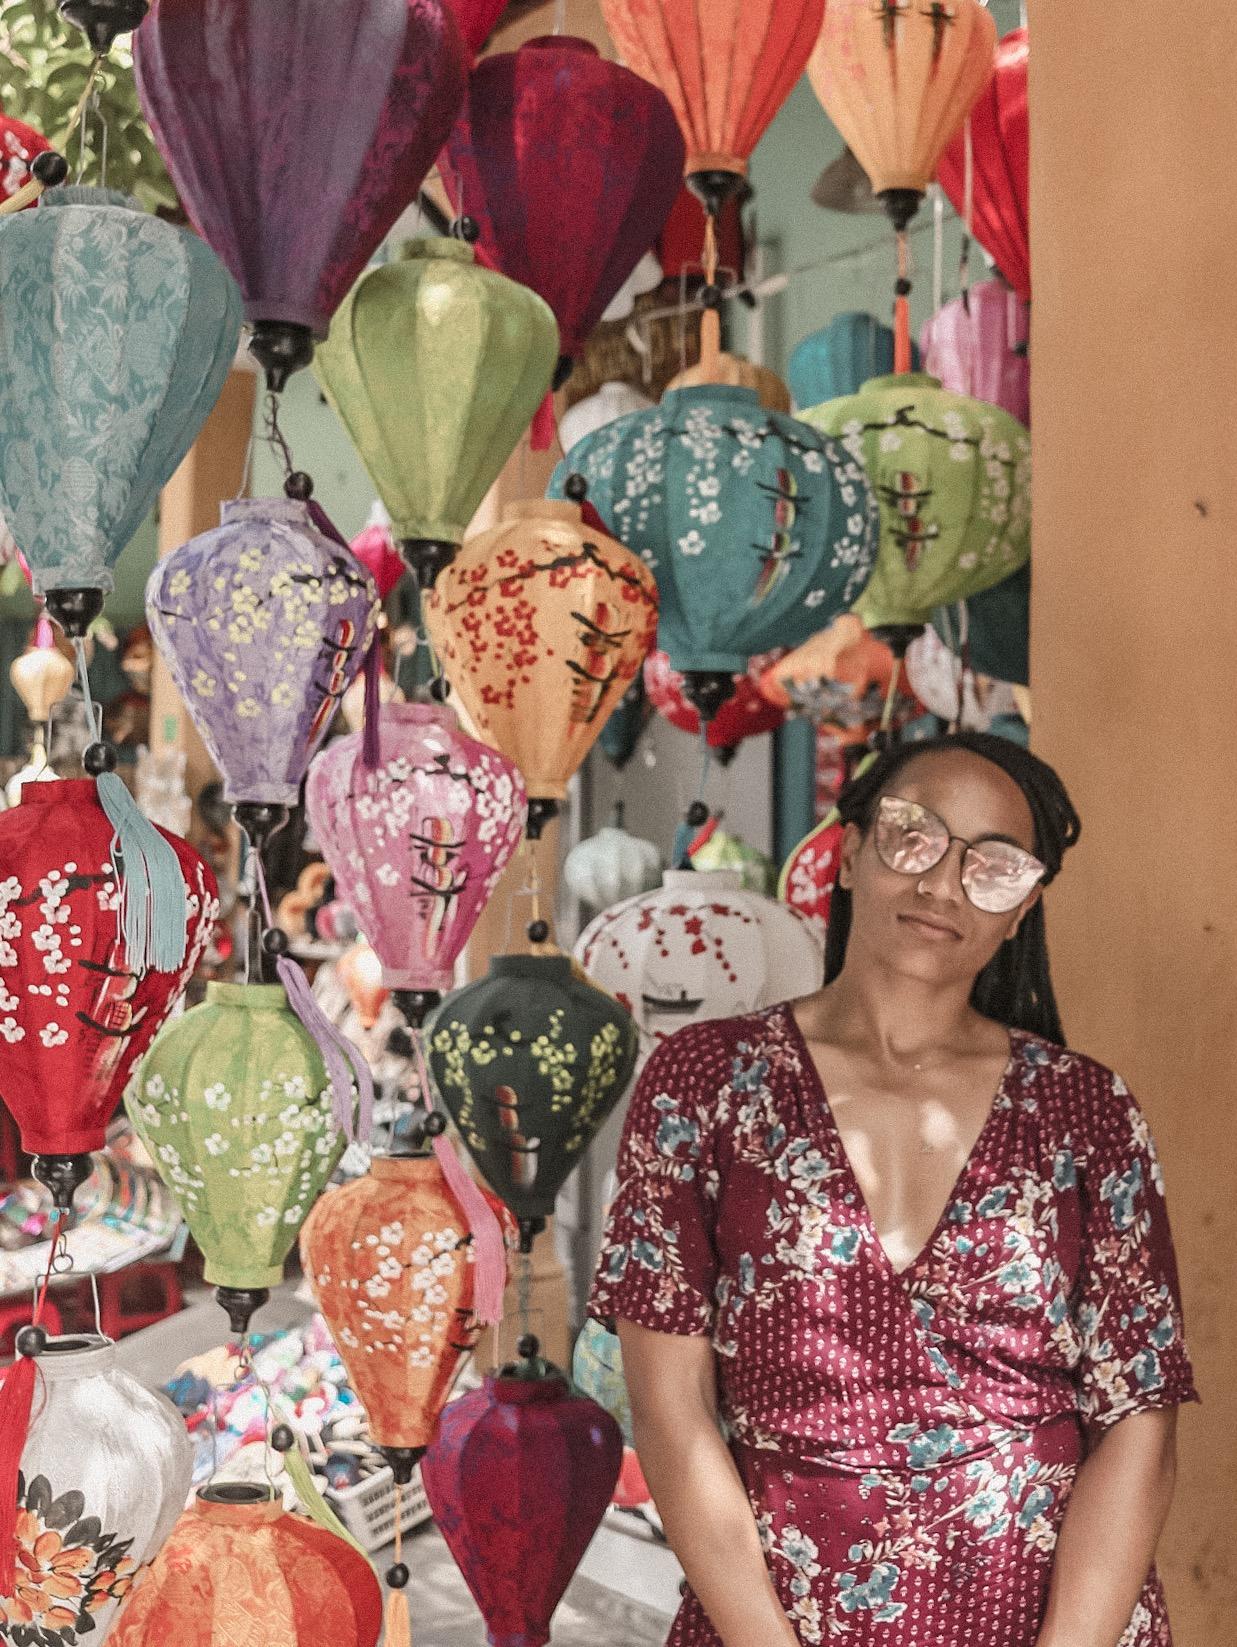 Illustrated by Sade - Lanterns in Hoi An, Vietnam